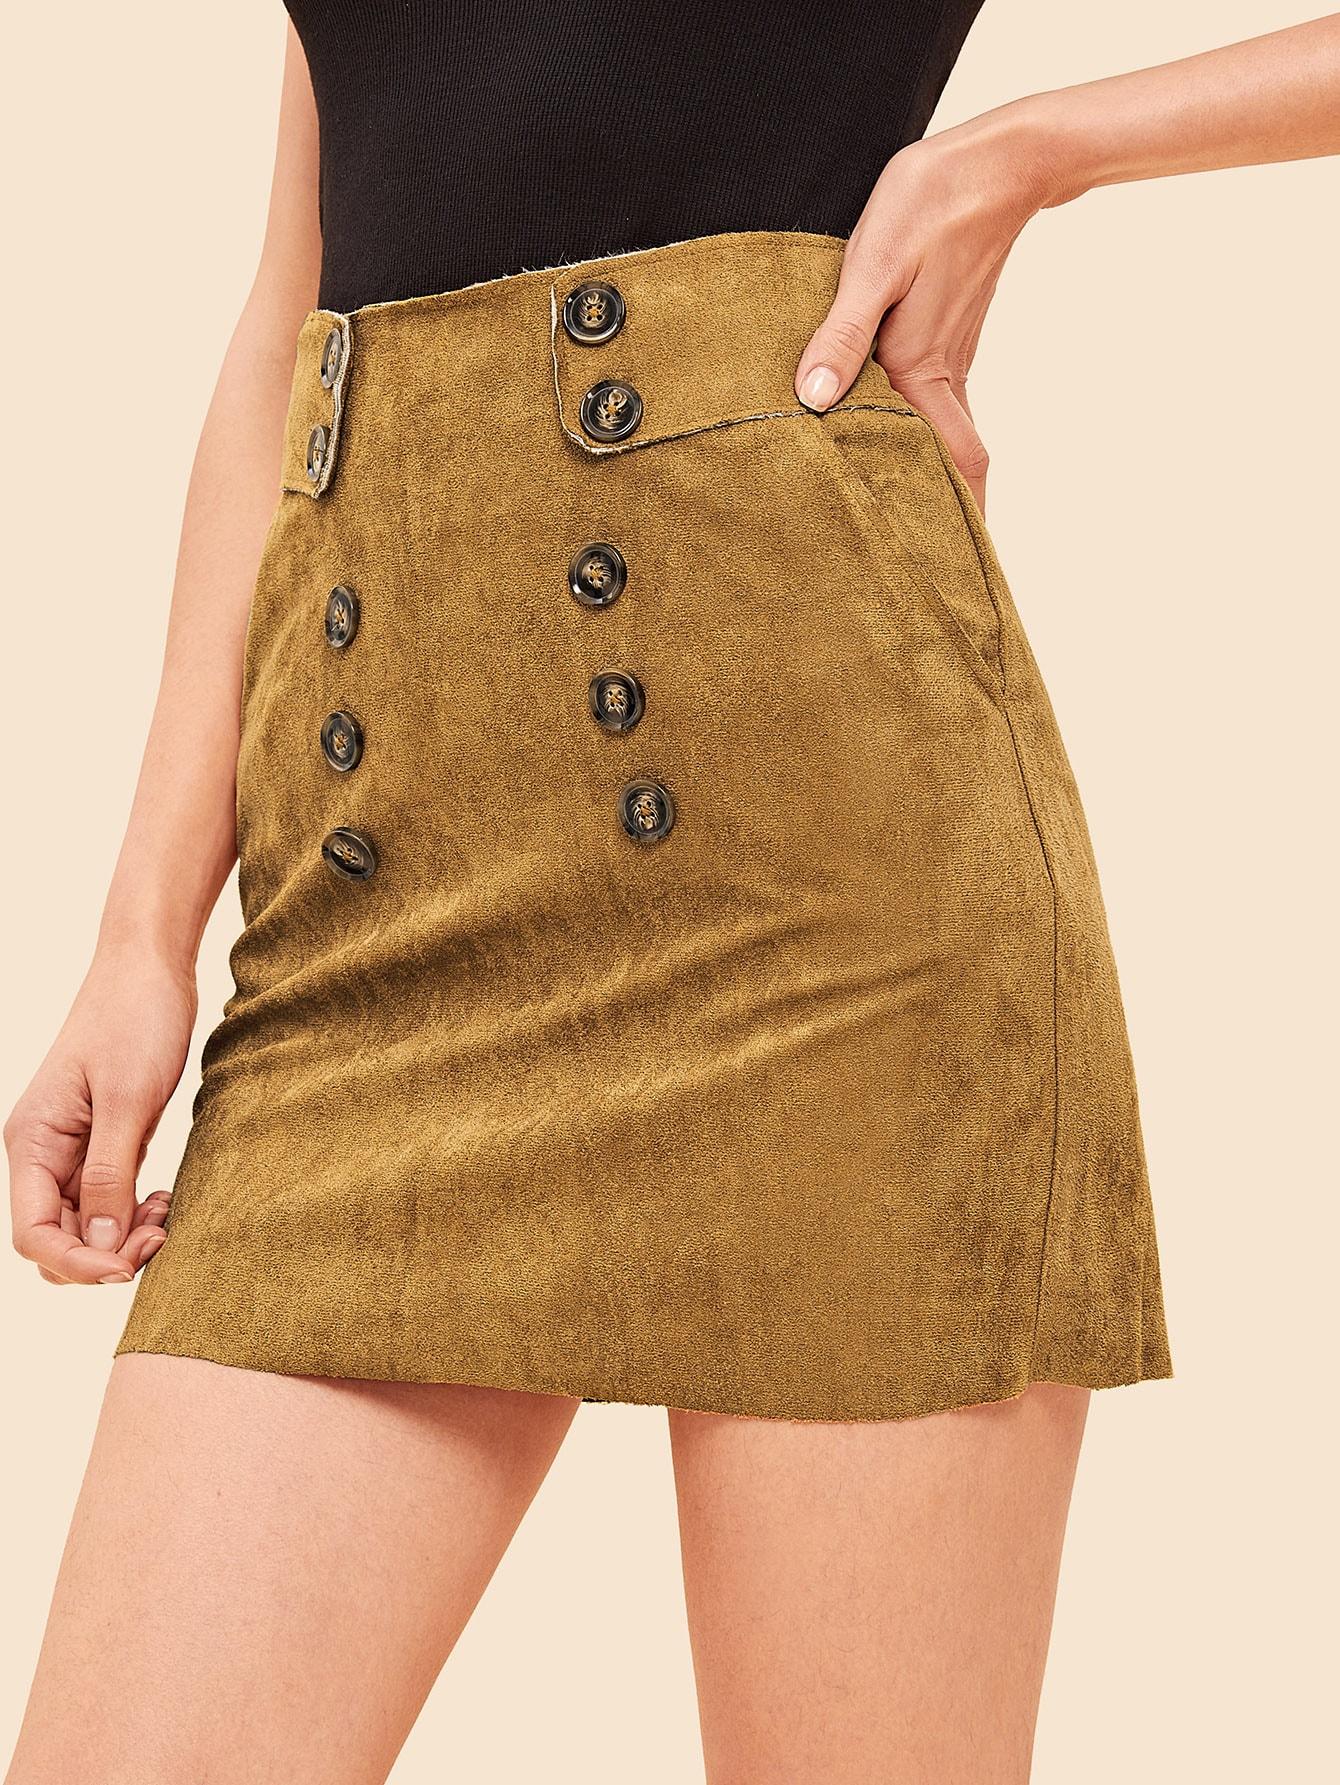 90s замшевая двухбортная юбка с карманом thumbnail